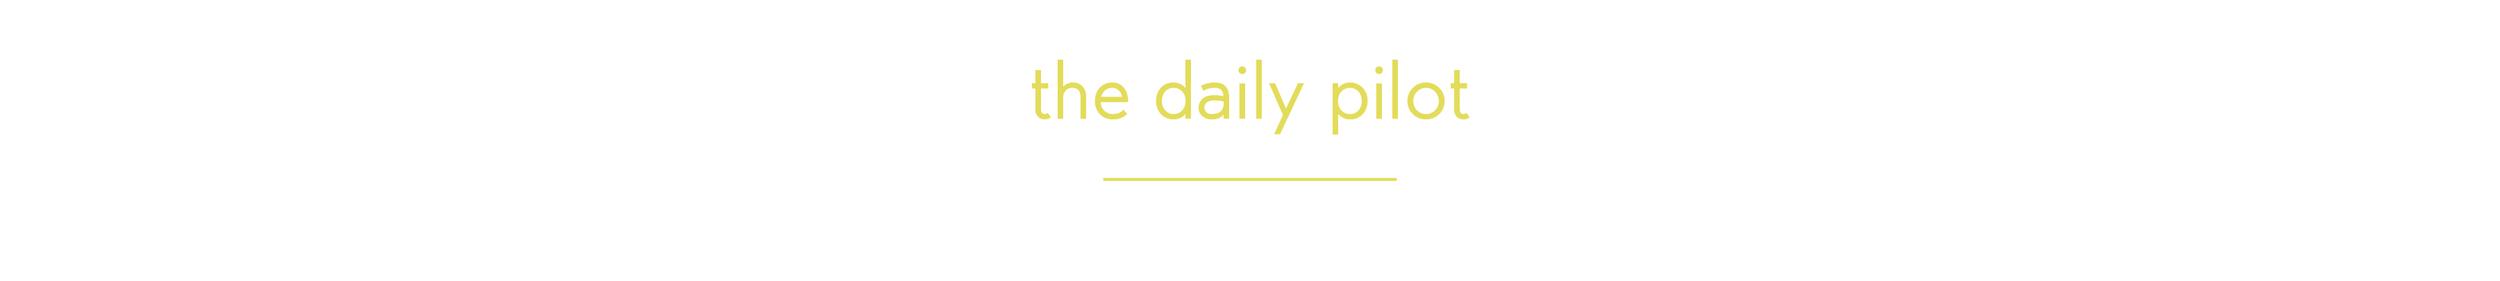 the daily pilot.jpg